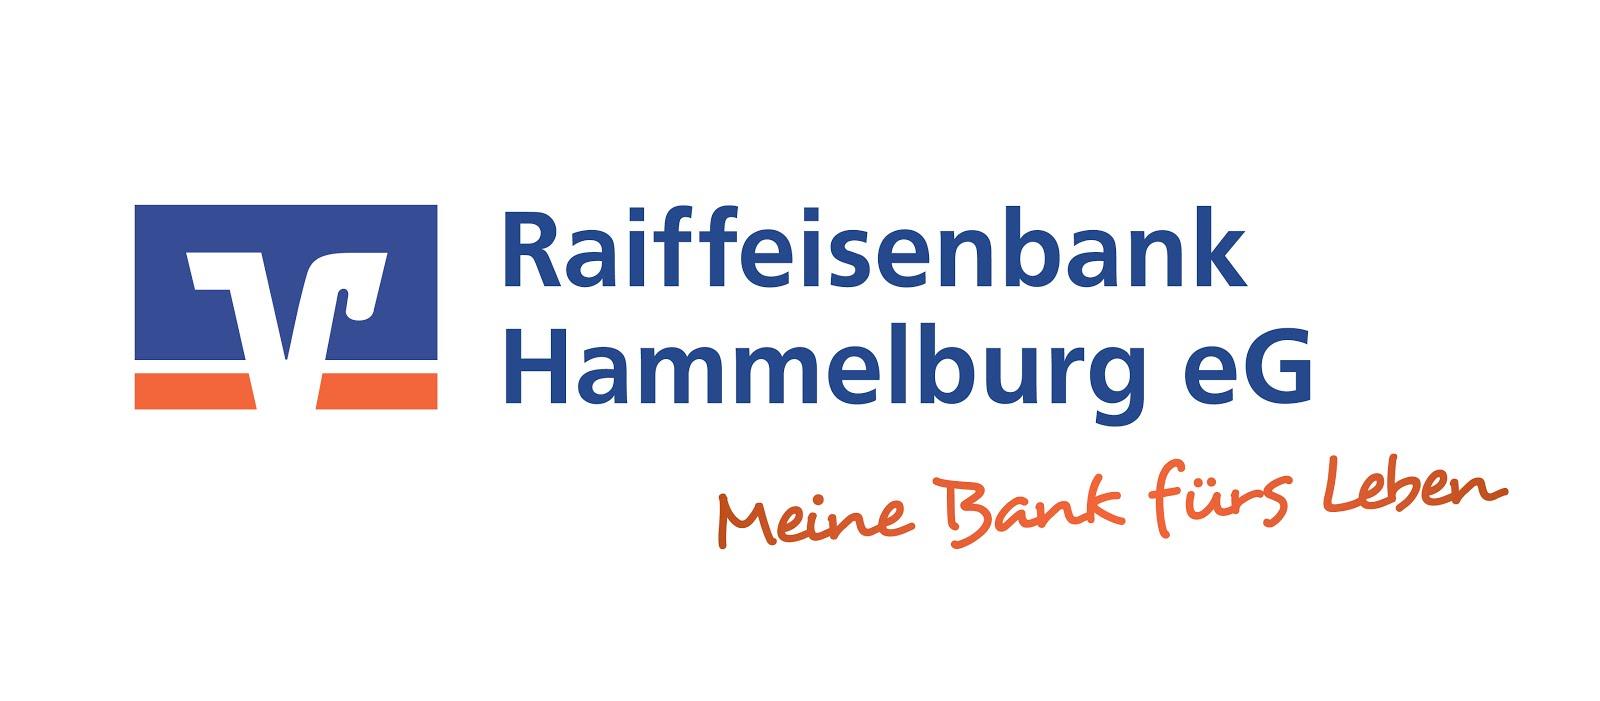 Raiffeisenbank Hammelburg